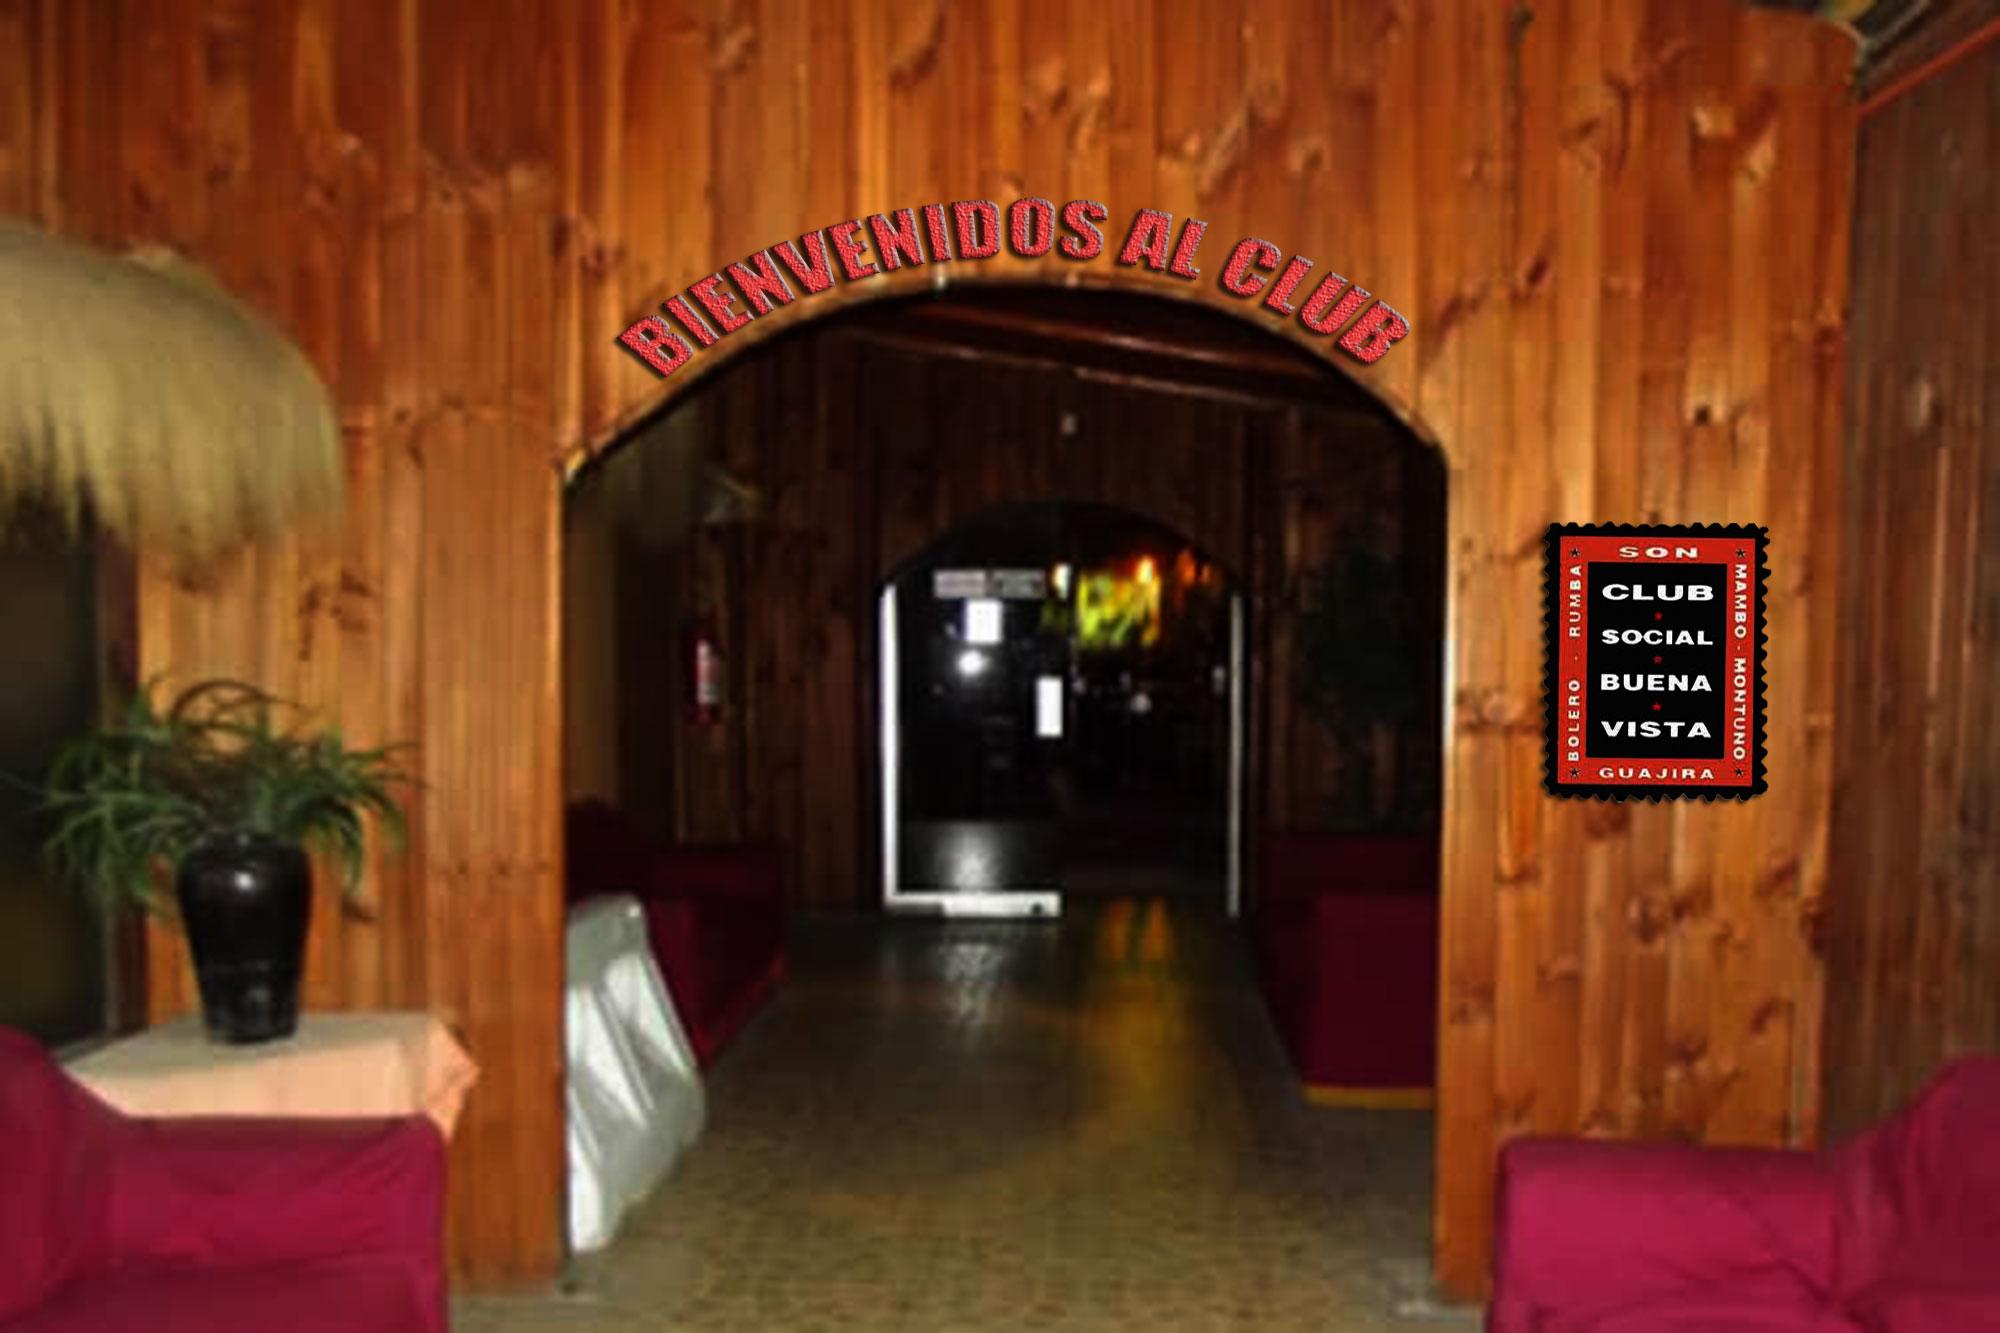 Club Social Buena Vista